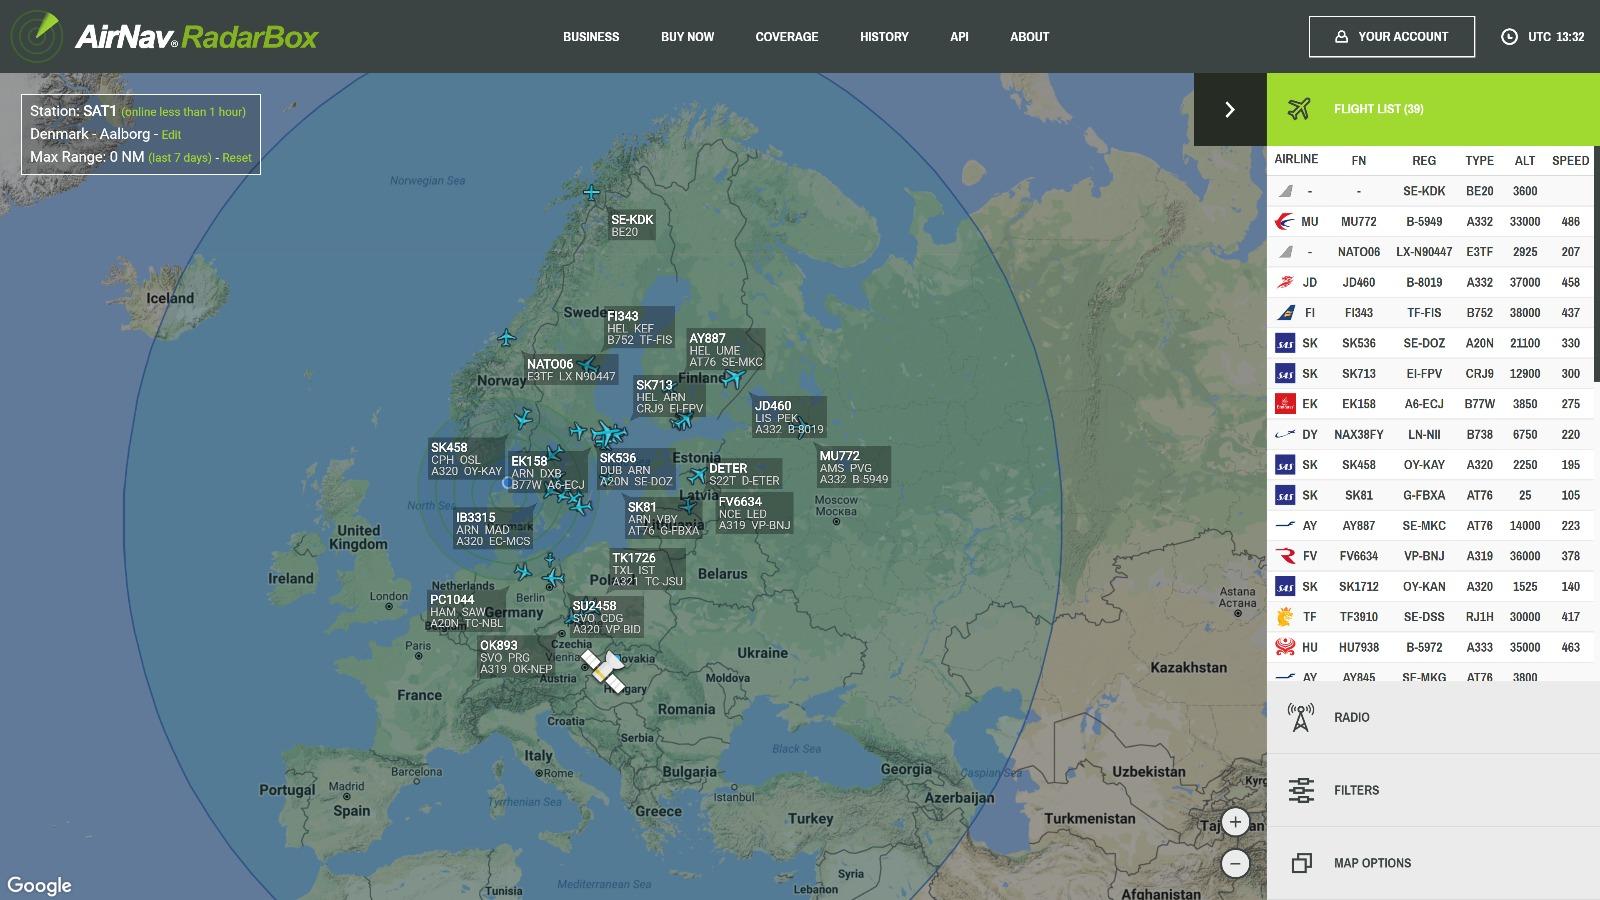 Space Based ADS-B - AirNav RadarBox - Live Flight Tracker